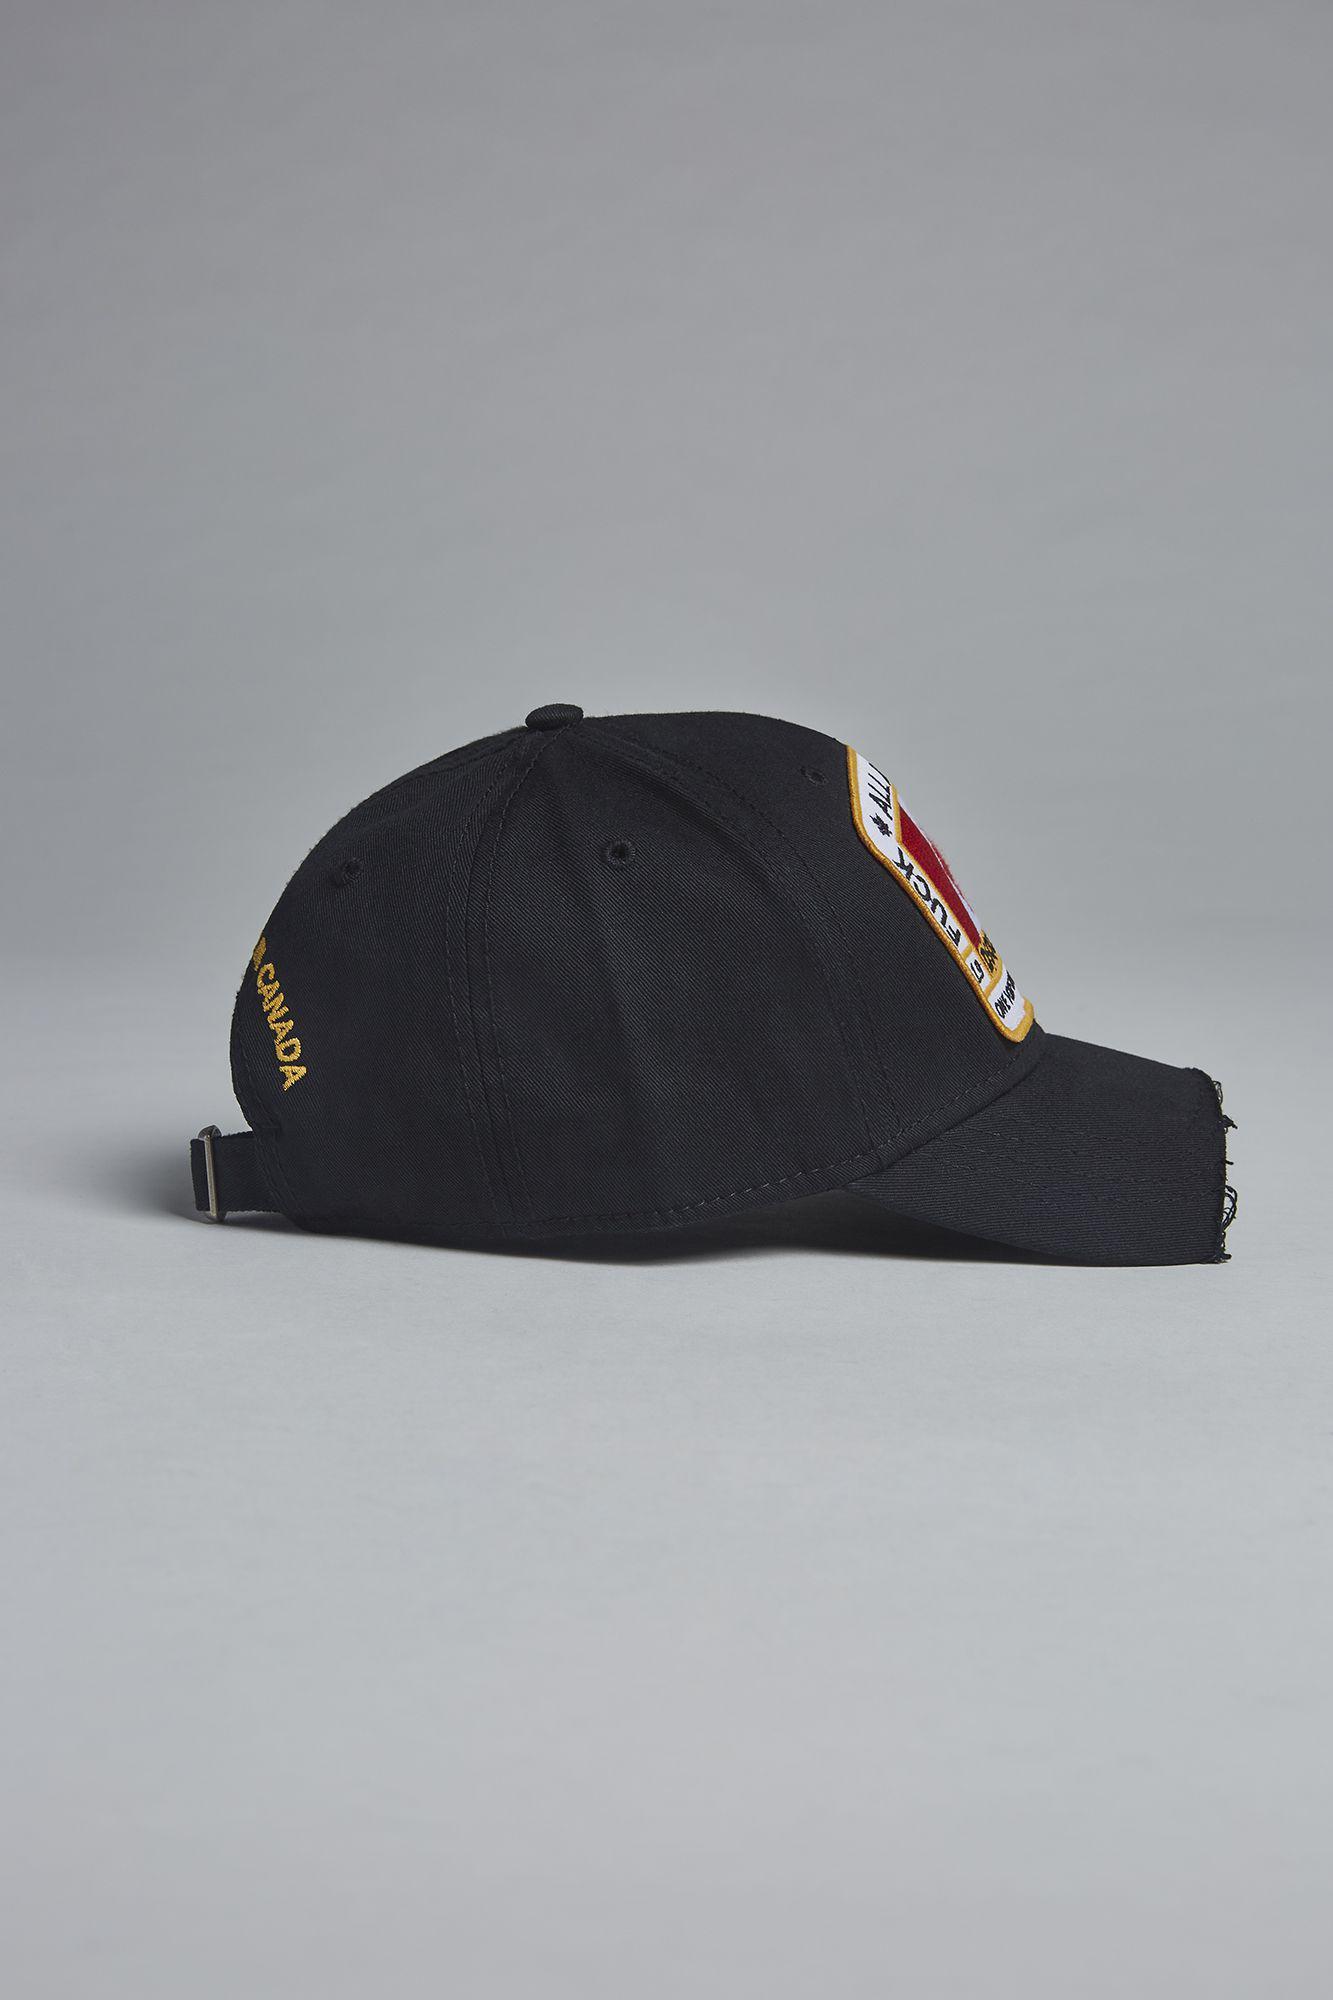 29c375bf2 DSquared² Canadian Heritage Piercing Baseball Cap in Black for Men ...